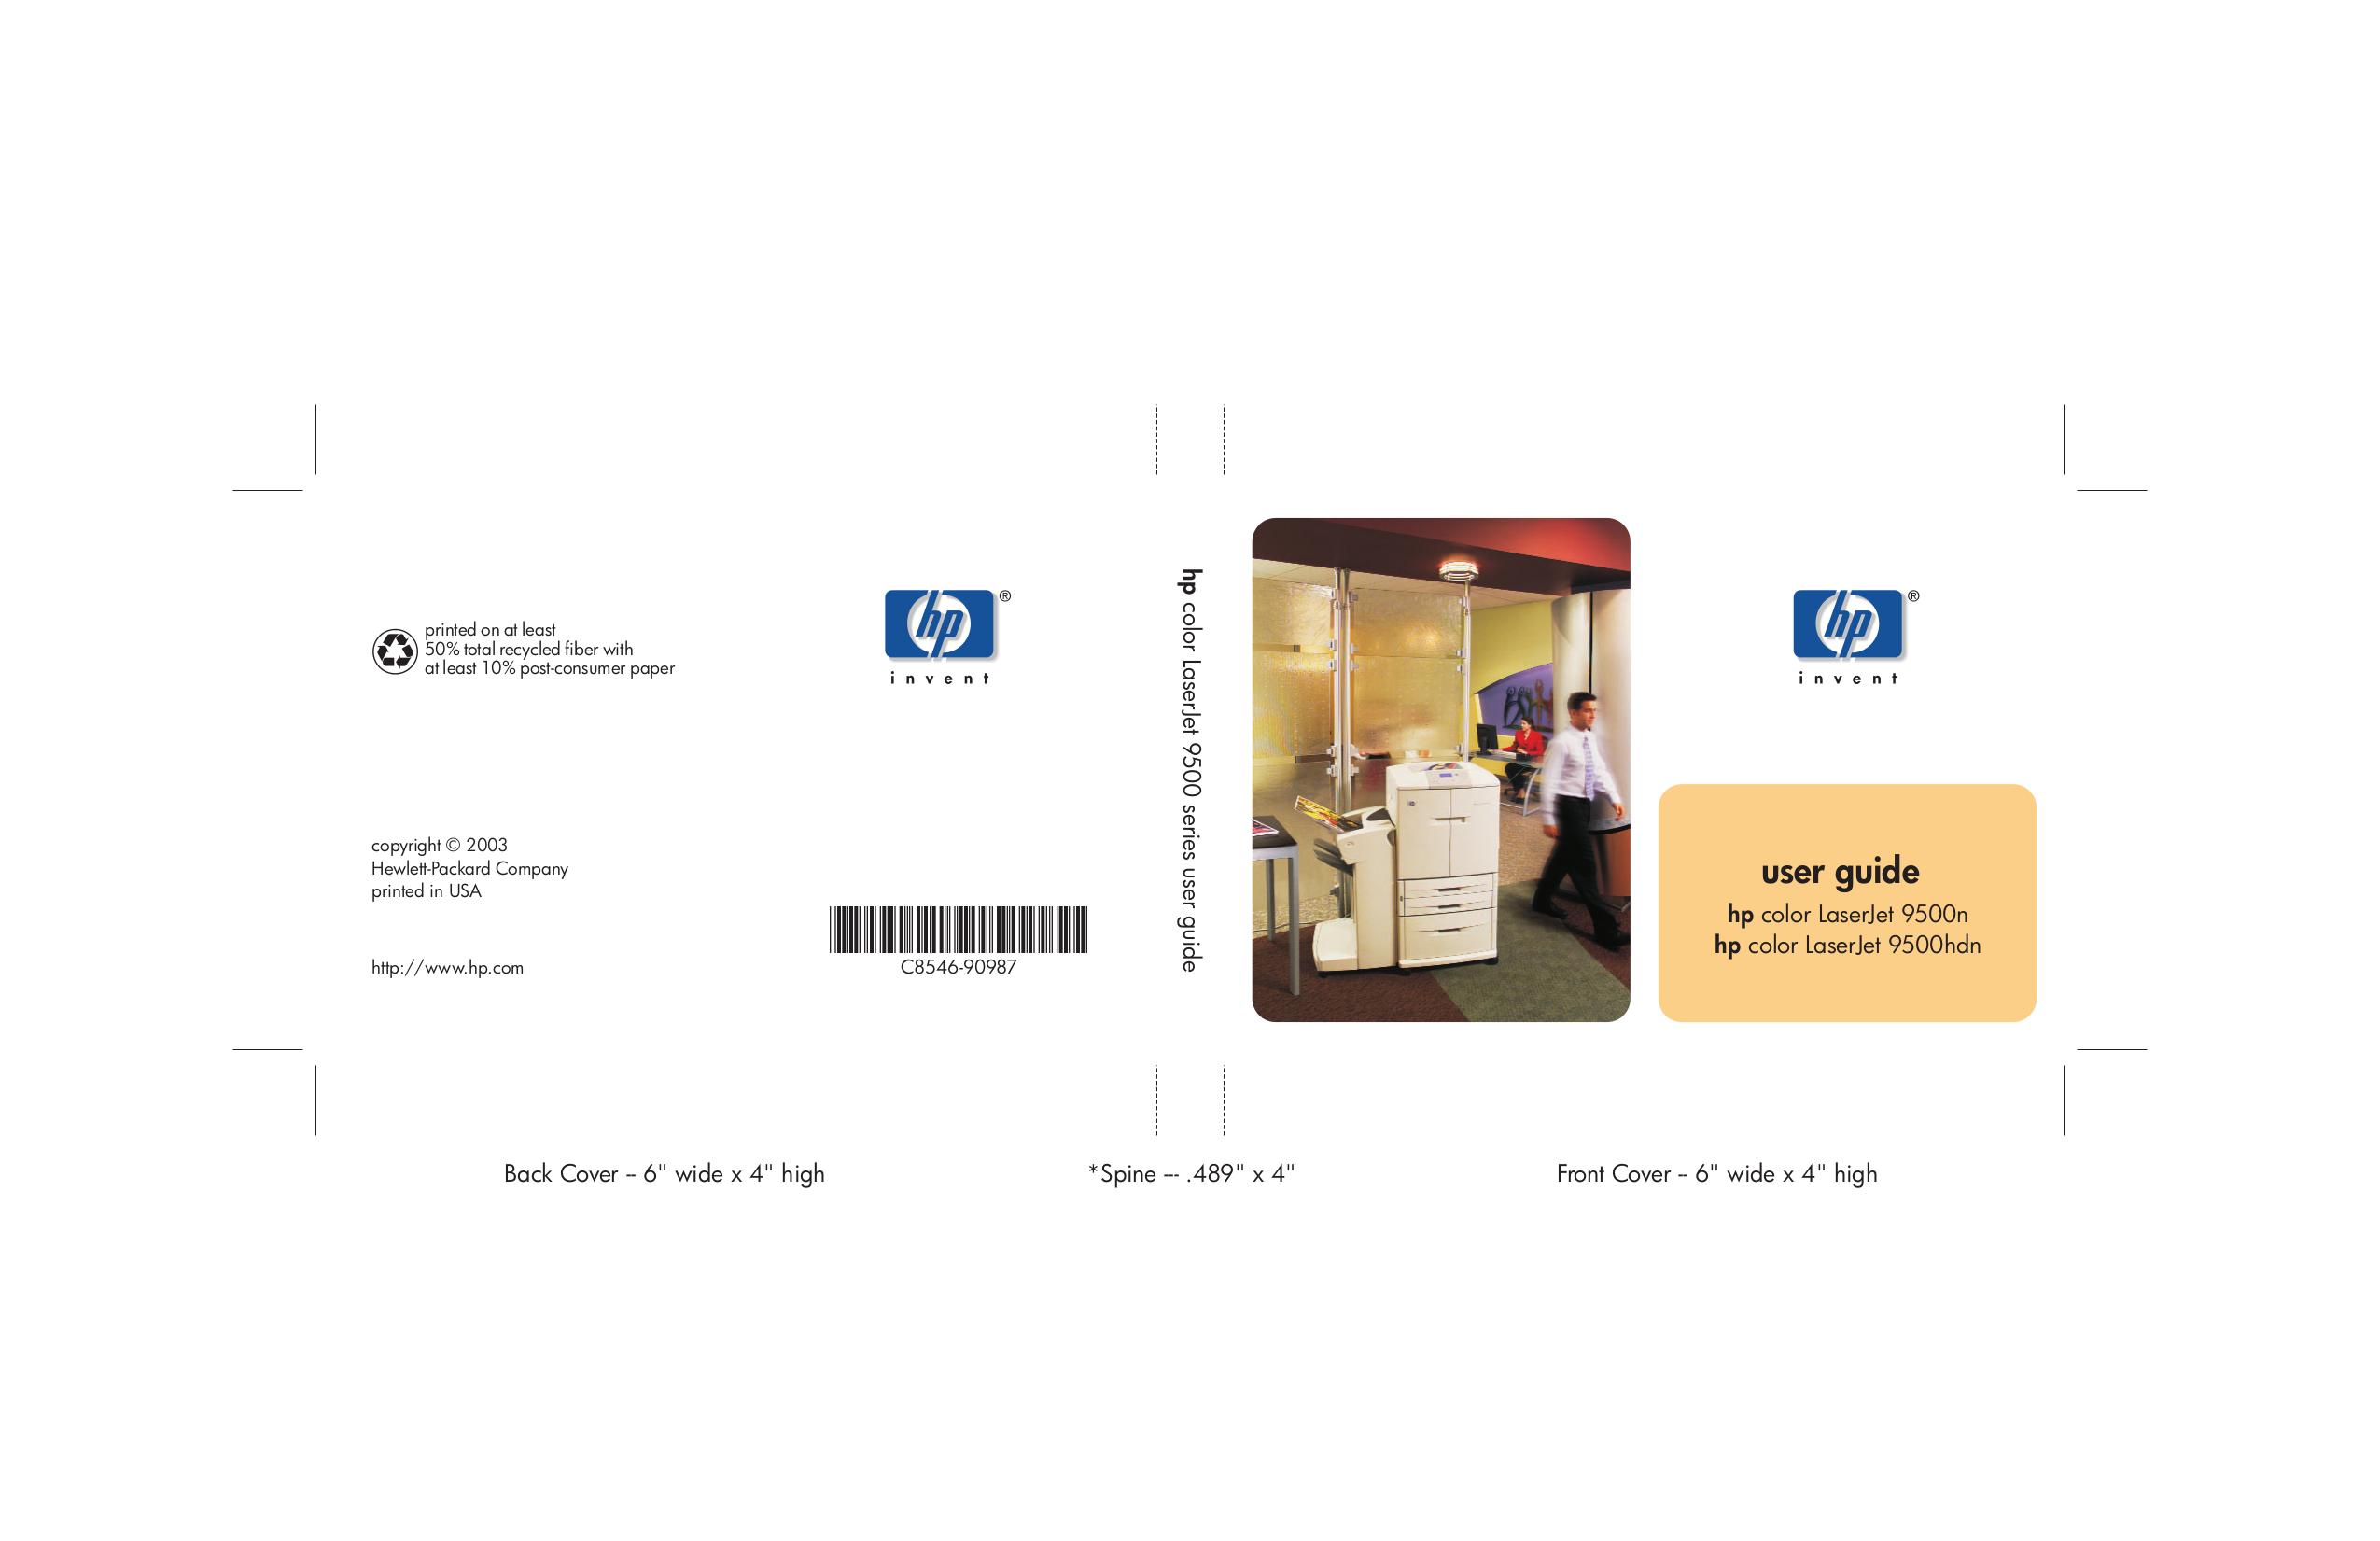 pdf for HP Printer Laserjet,Color Laserjet 8550gn manual